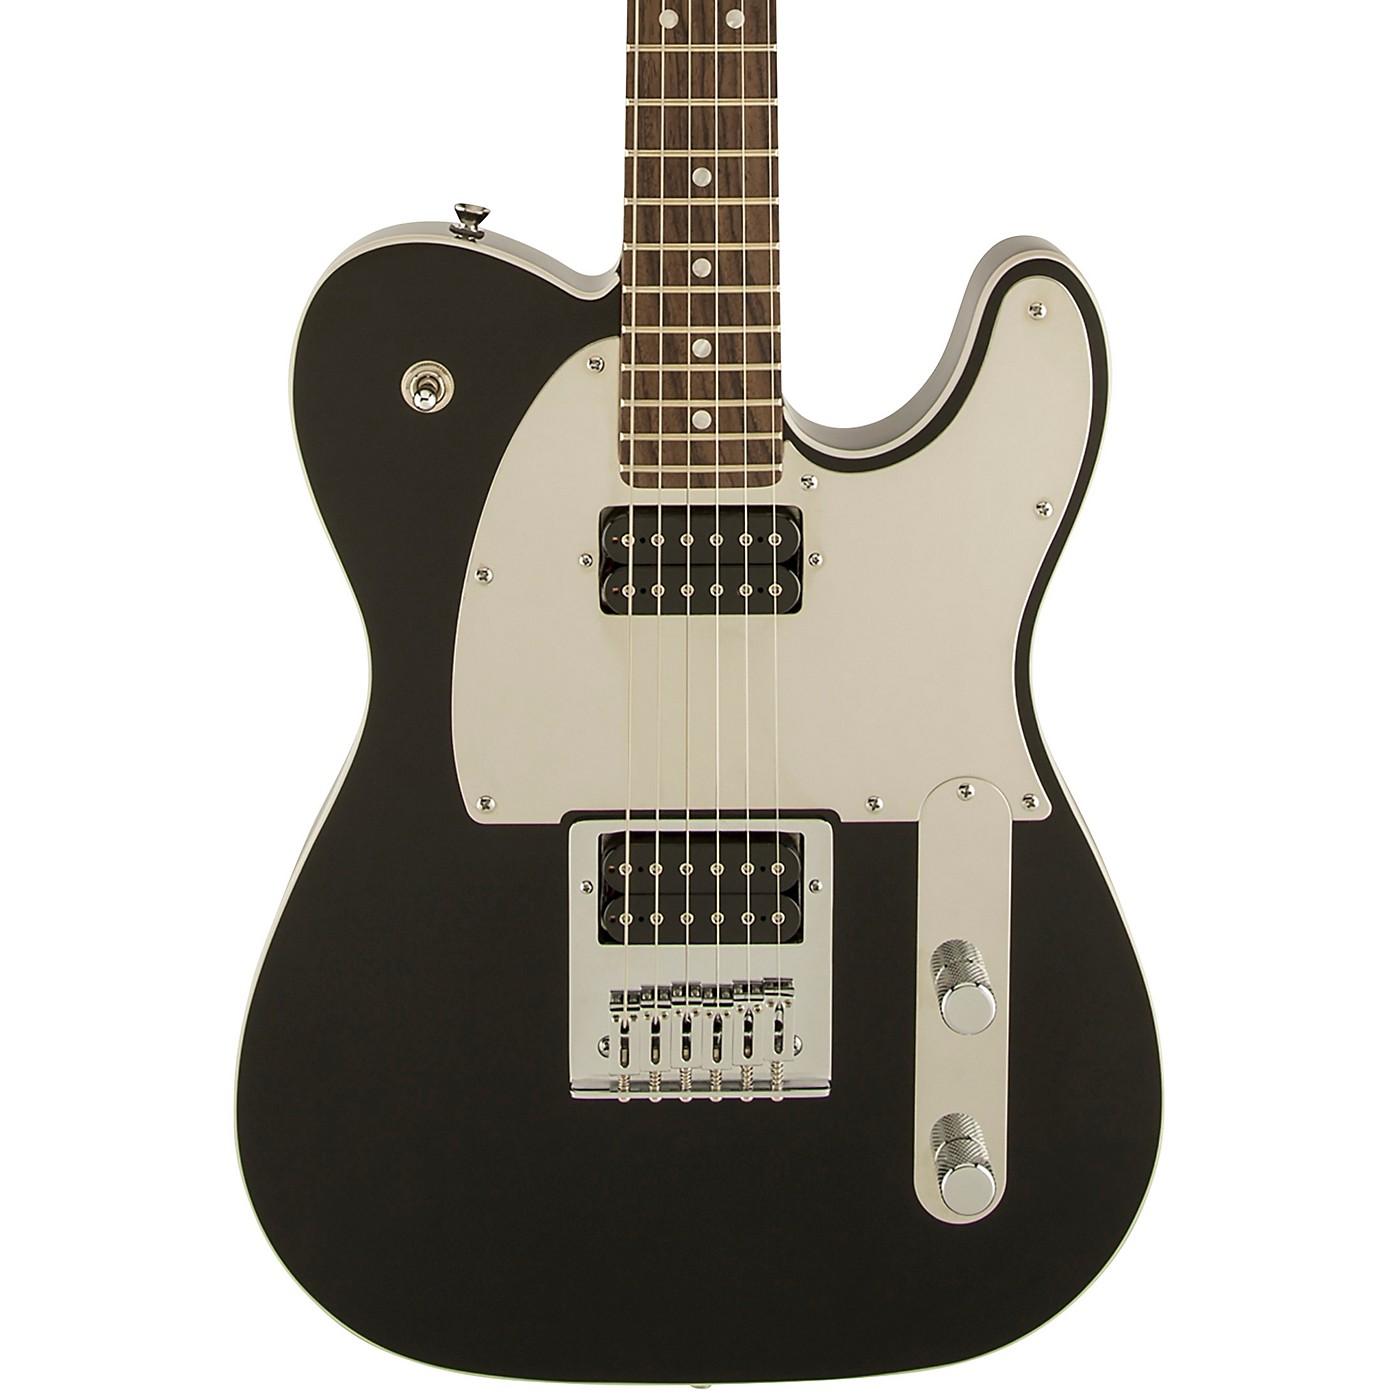 Squier J5 Telecaster Electric Guitar thumbnail